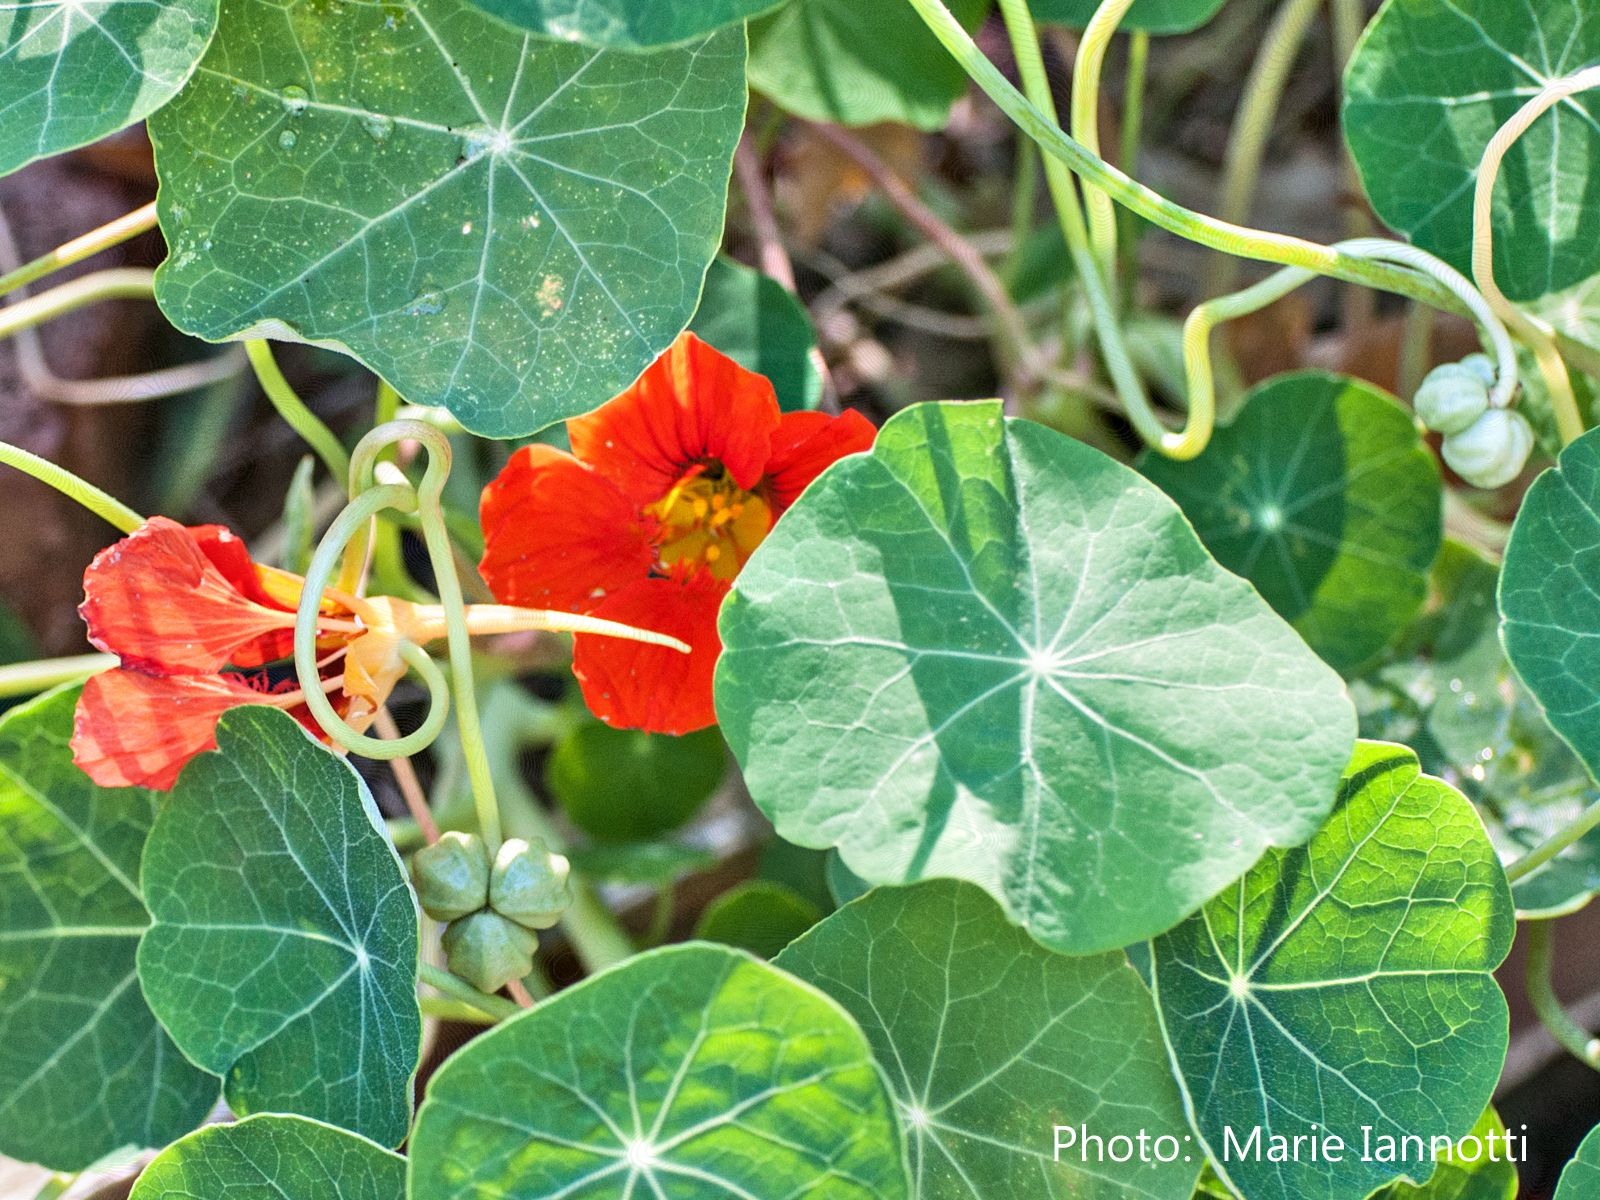 Buy culinary herbs plants nasturtium plants - Buy Culinary Herbs Plants Nasturtium Plants 14